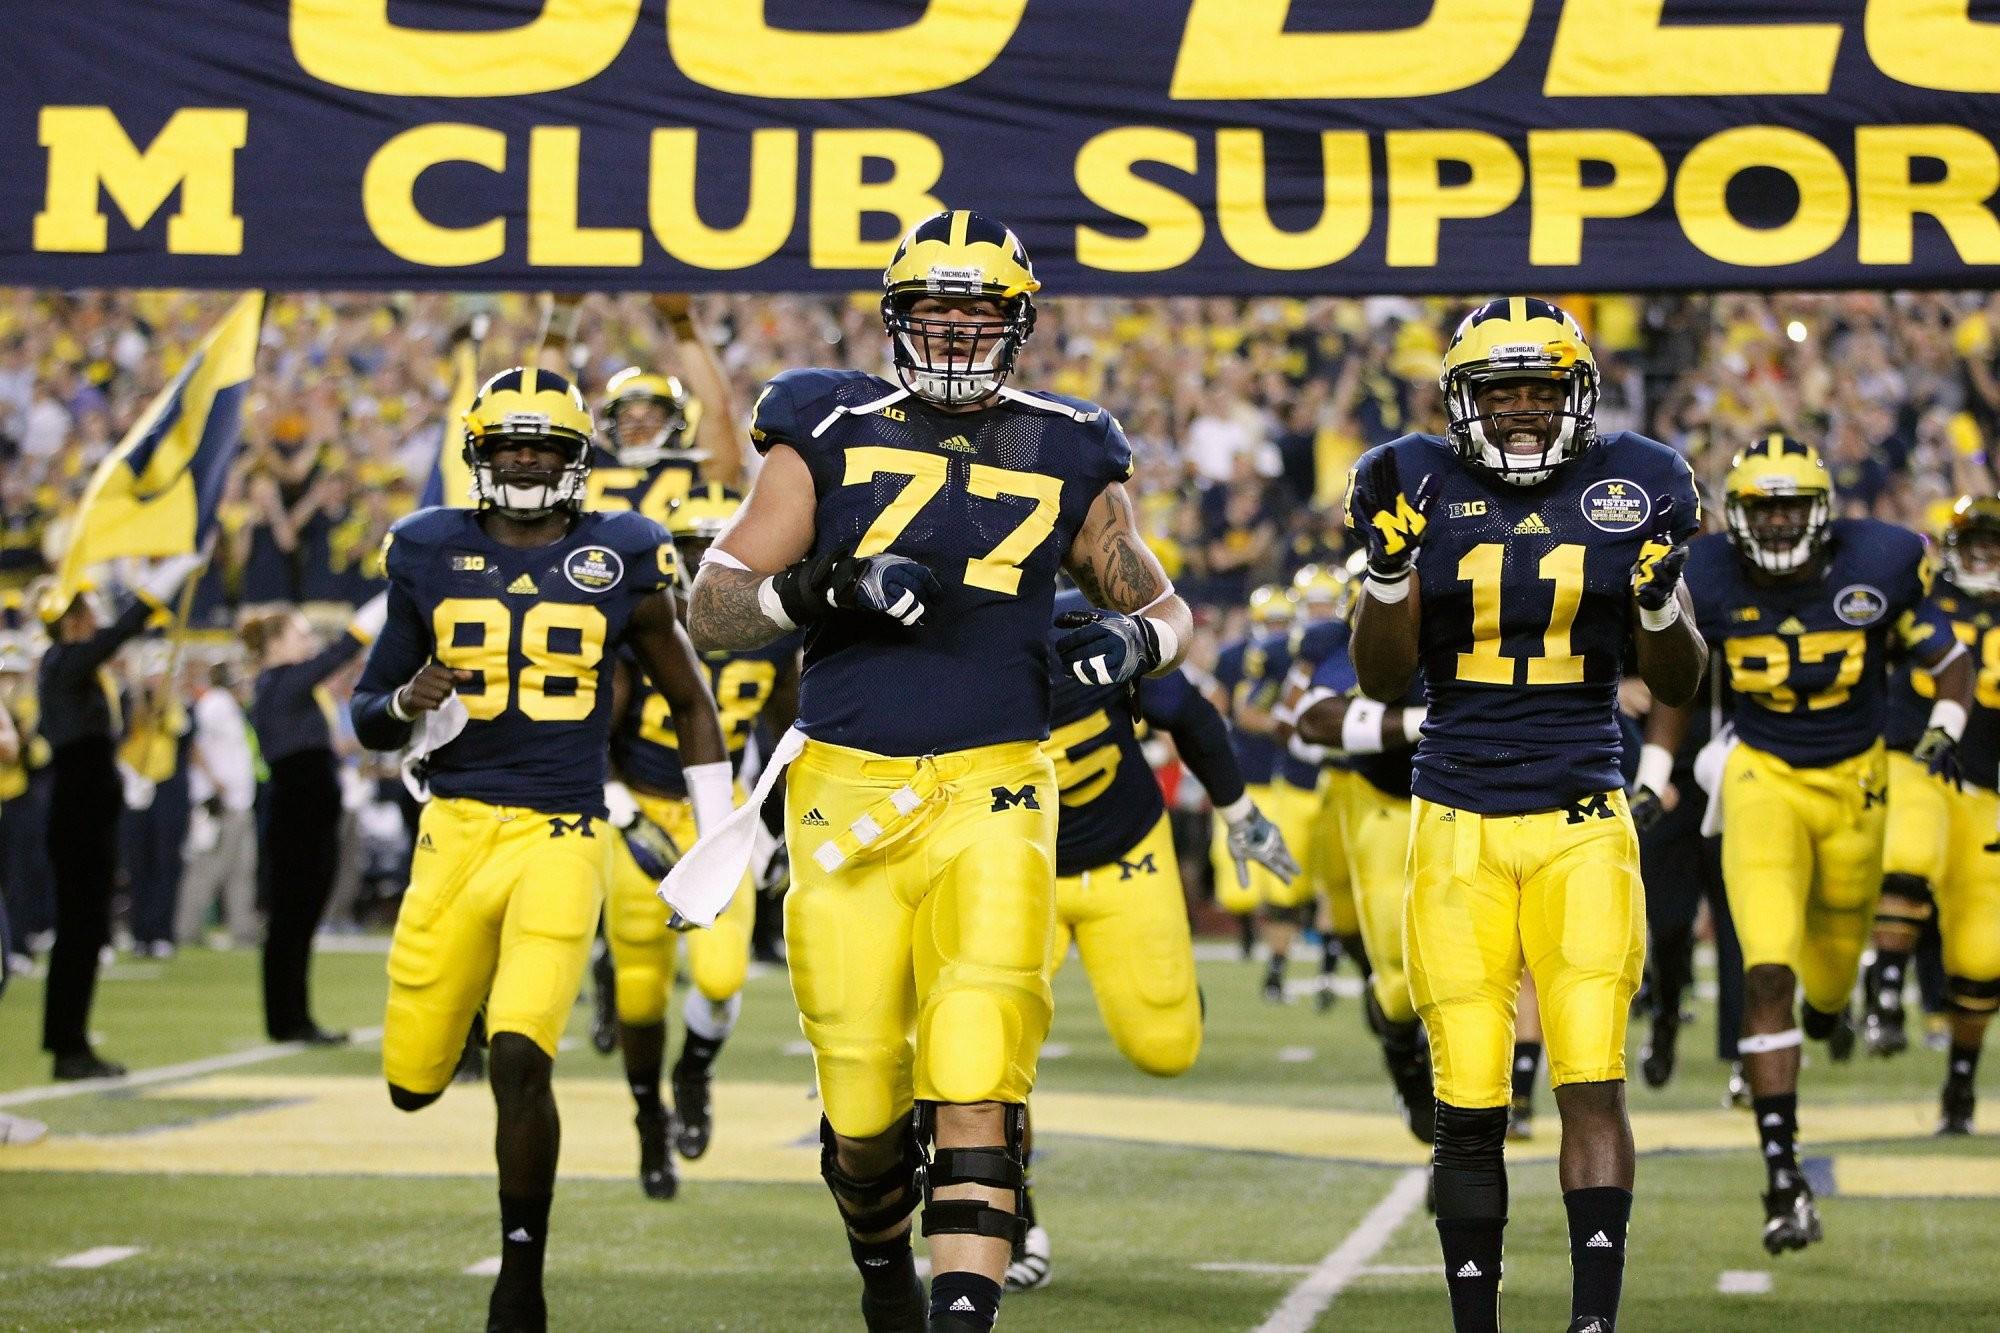 Michigan Wolverines Football Wallpapers: University Of Michigan Screensaver Wallpaper (55+ Images